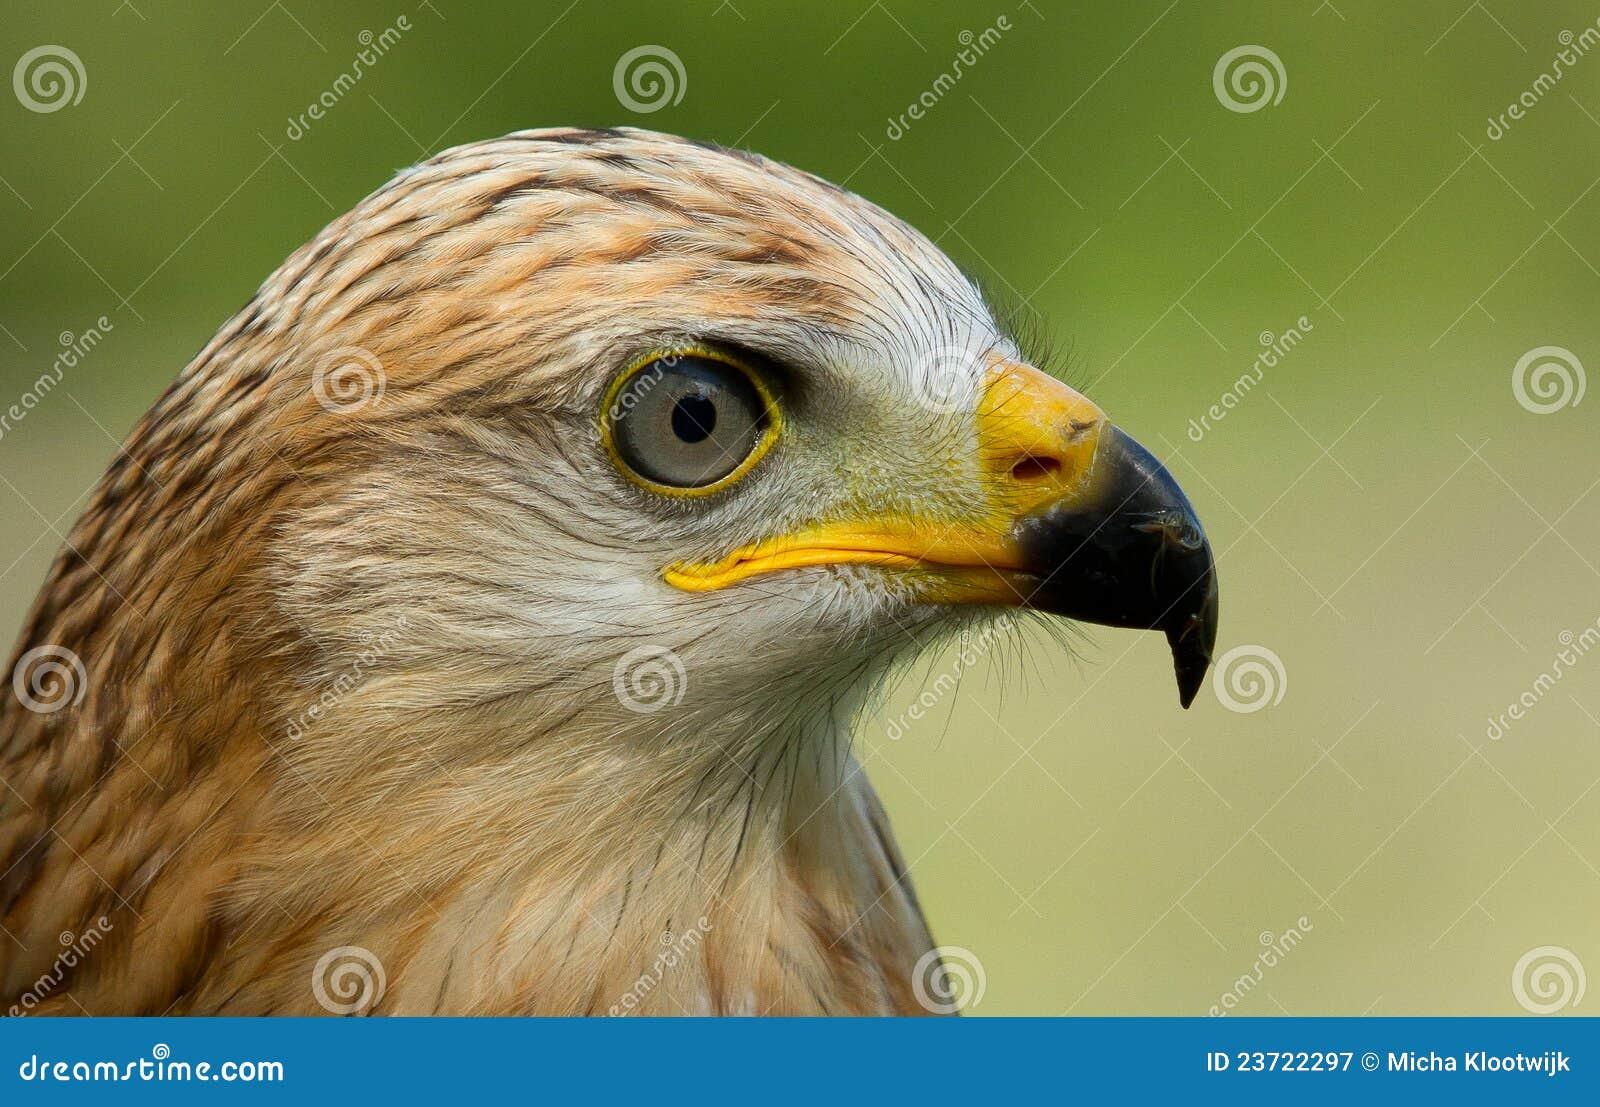 Un halcón zanquilargo